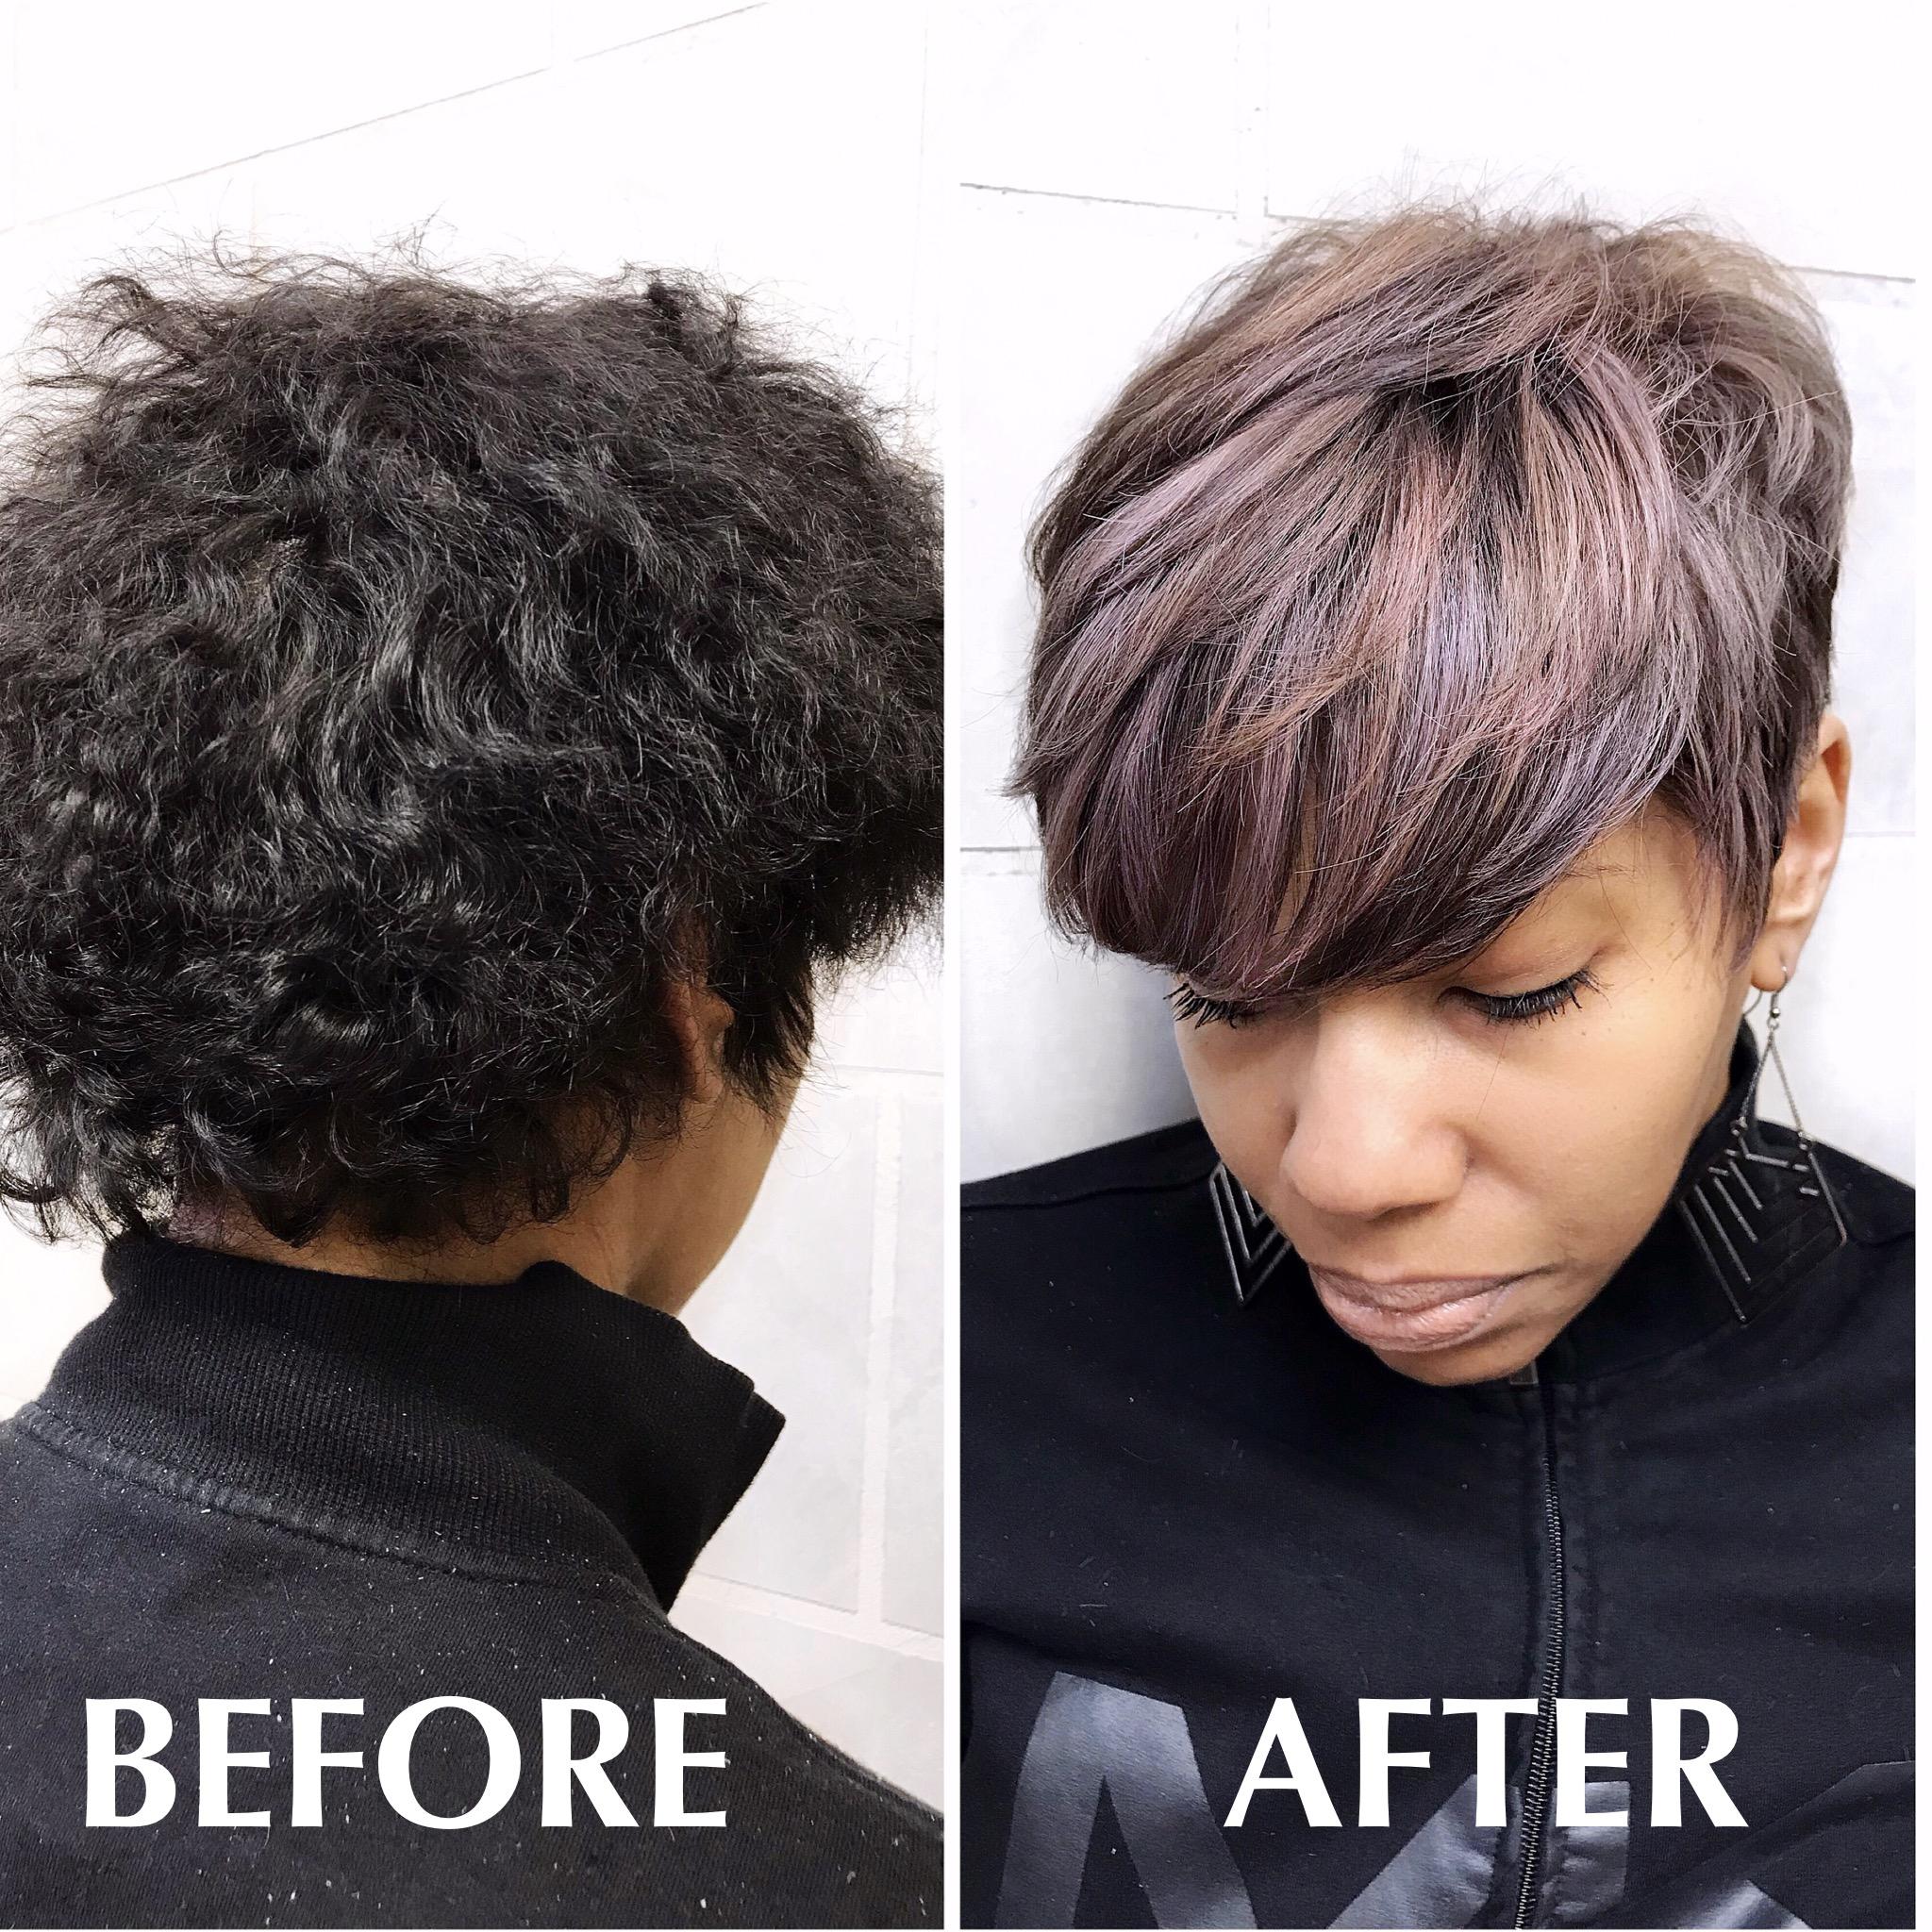 african american hair salon ballantyne, best hair salon near me, curly hair expert ballantyne, Charlotte Hair colorists, Ballantyne salon, best hair stylist in Charlotte, Balayage charlotte